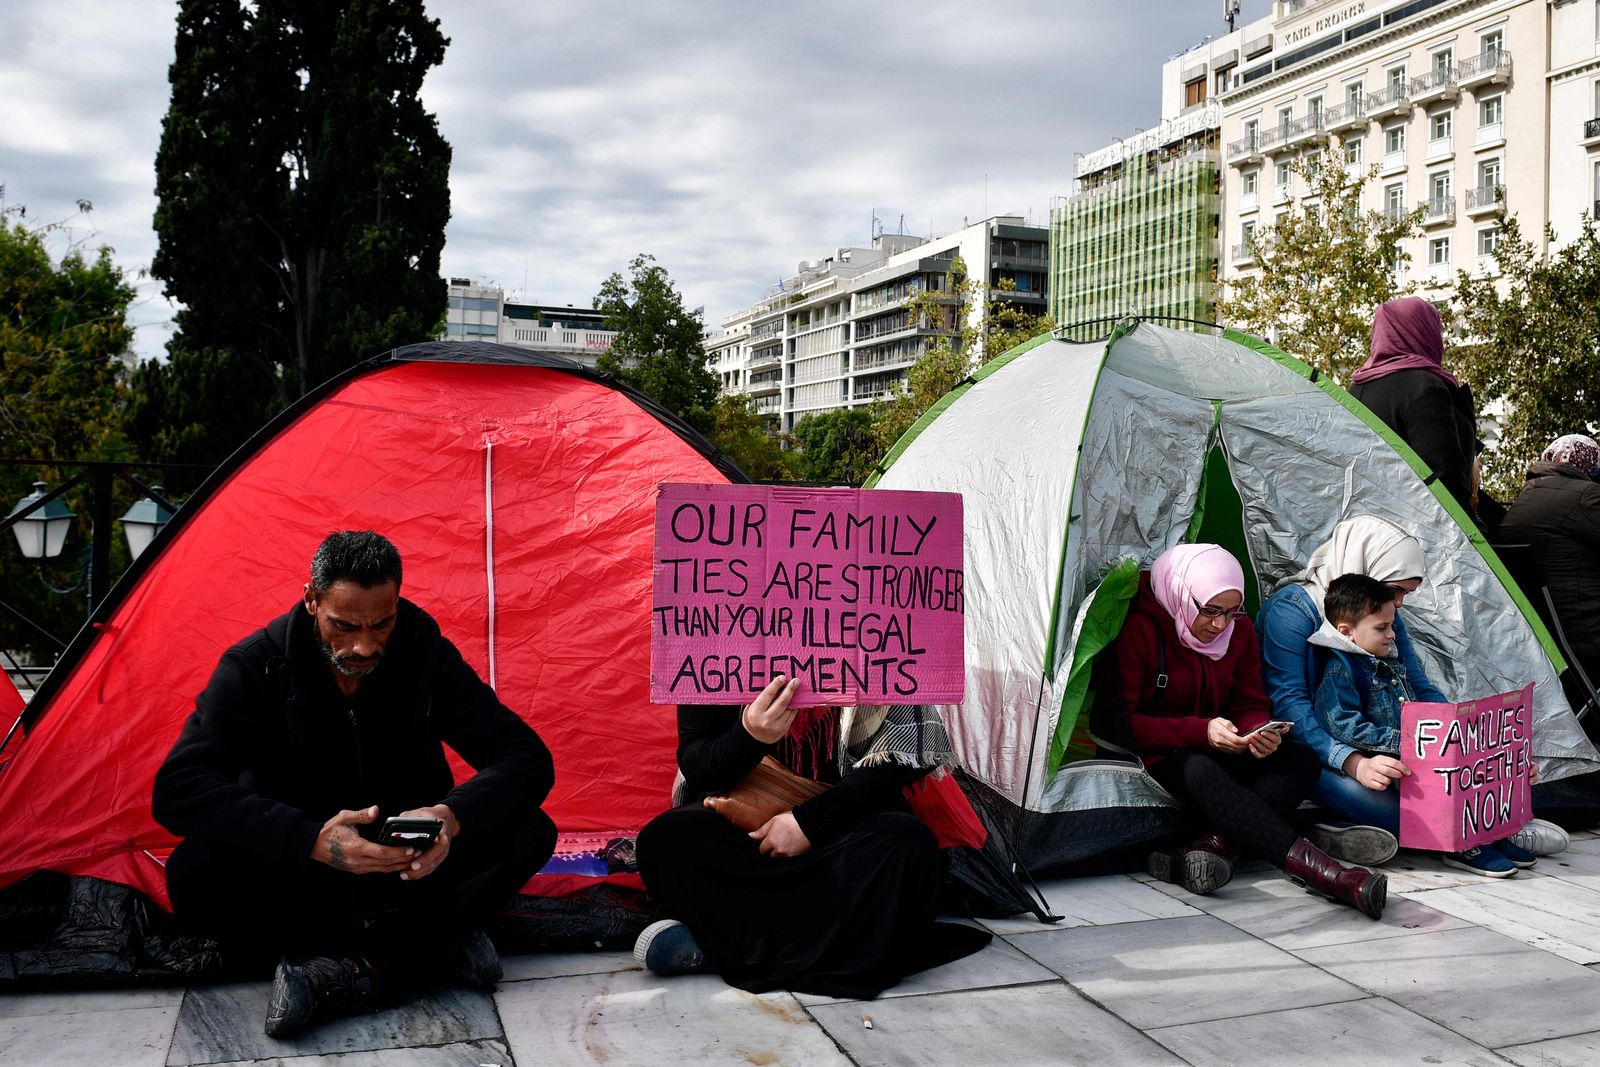 Familiennachzug/ Migranten/ Flüchtlinge